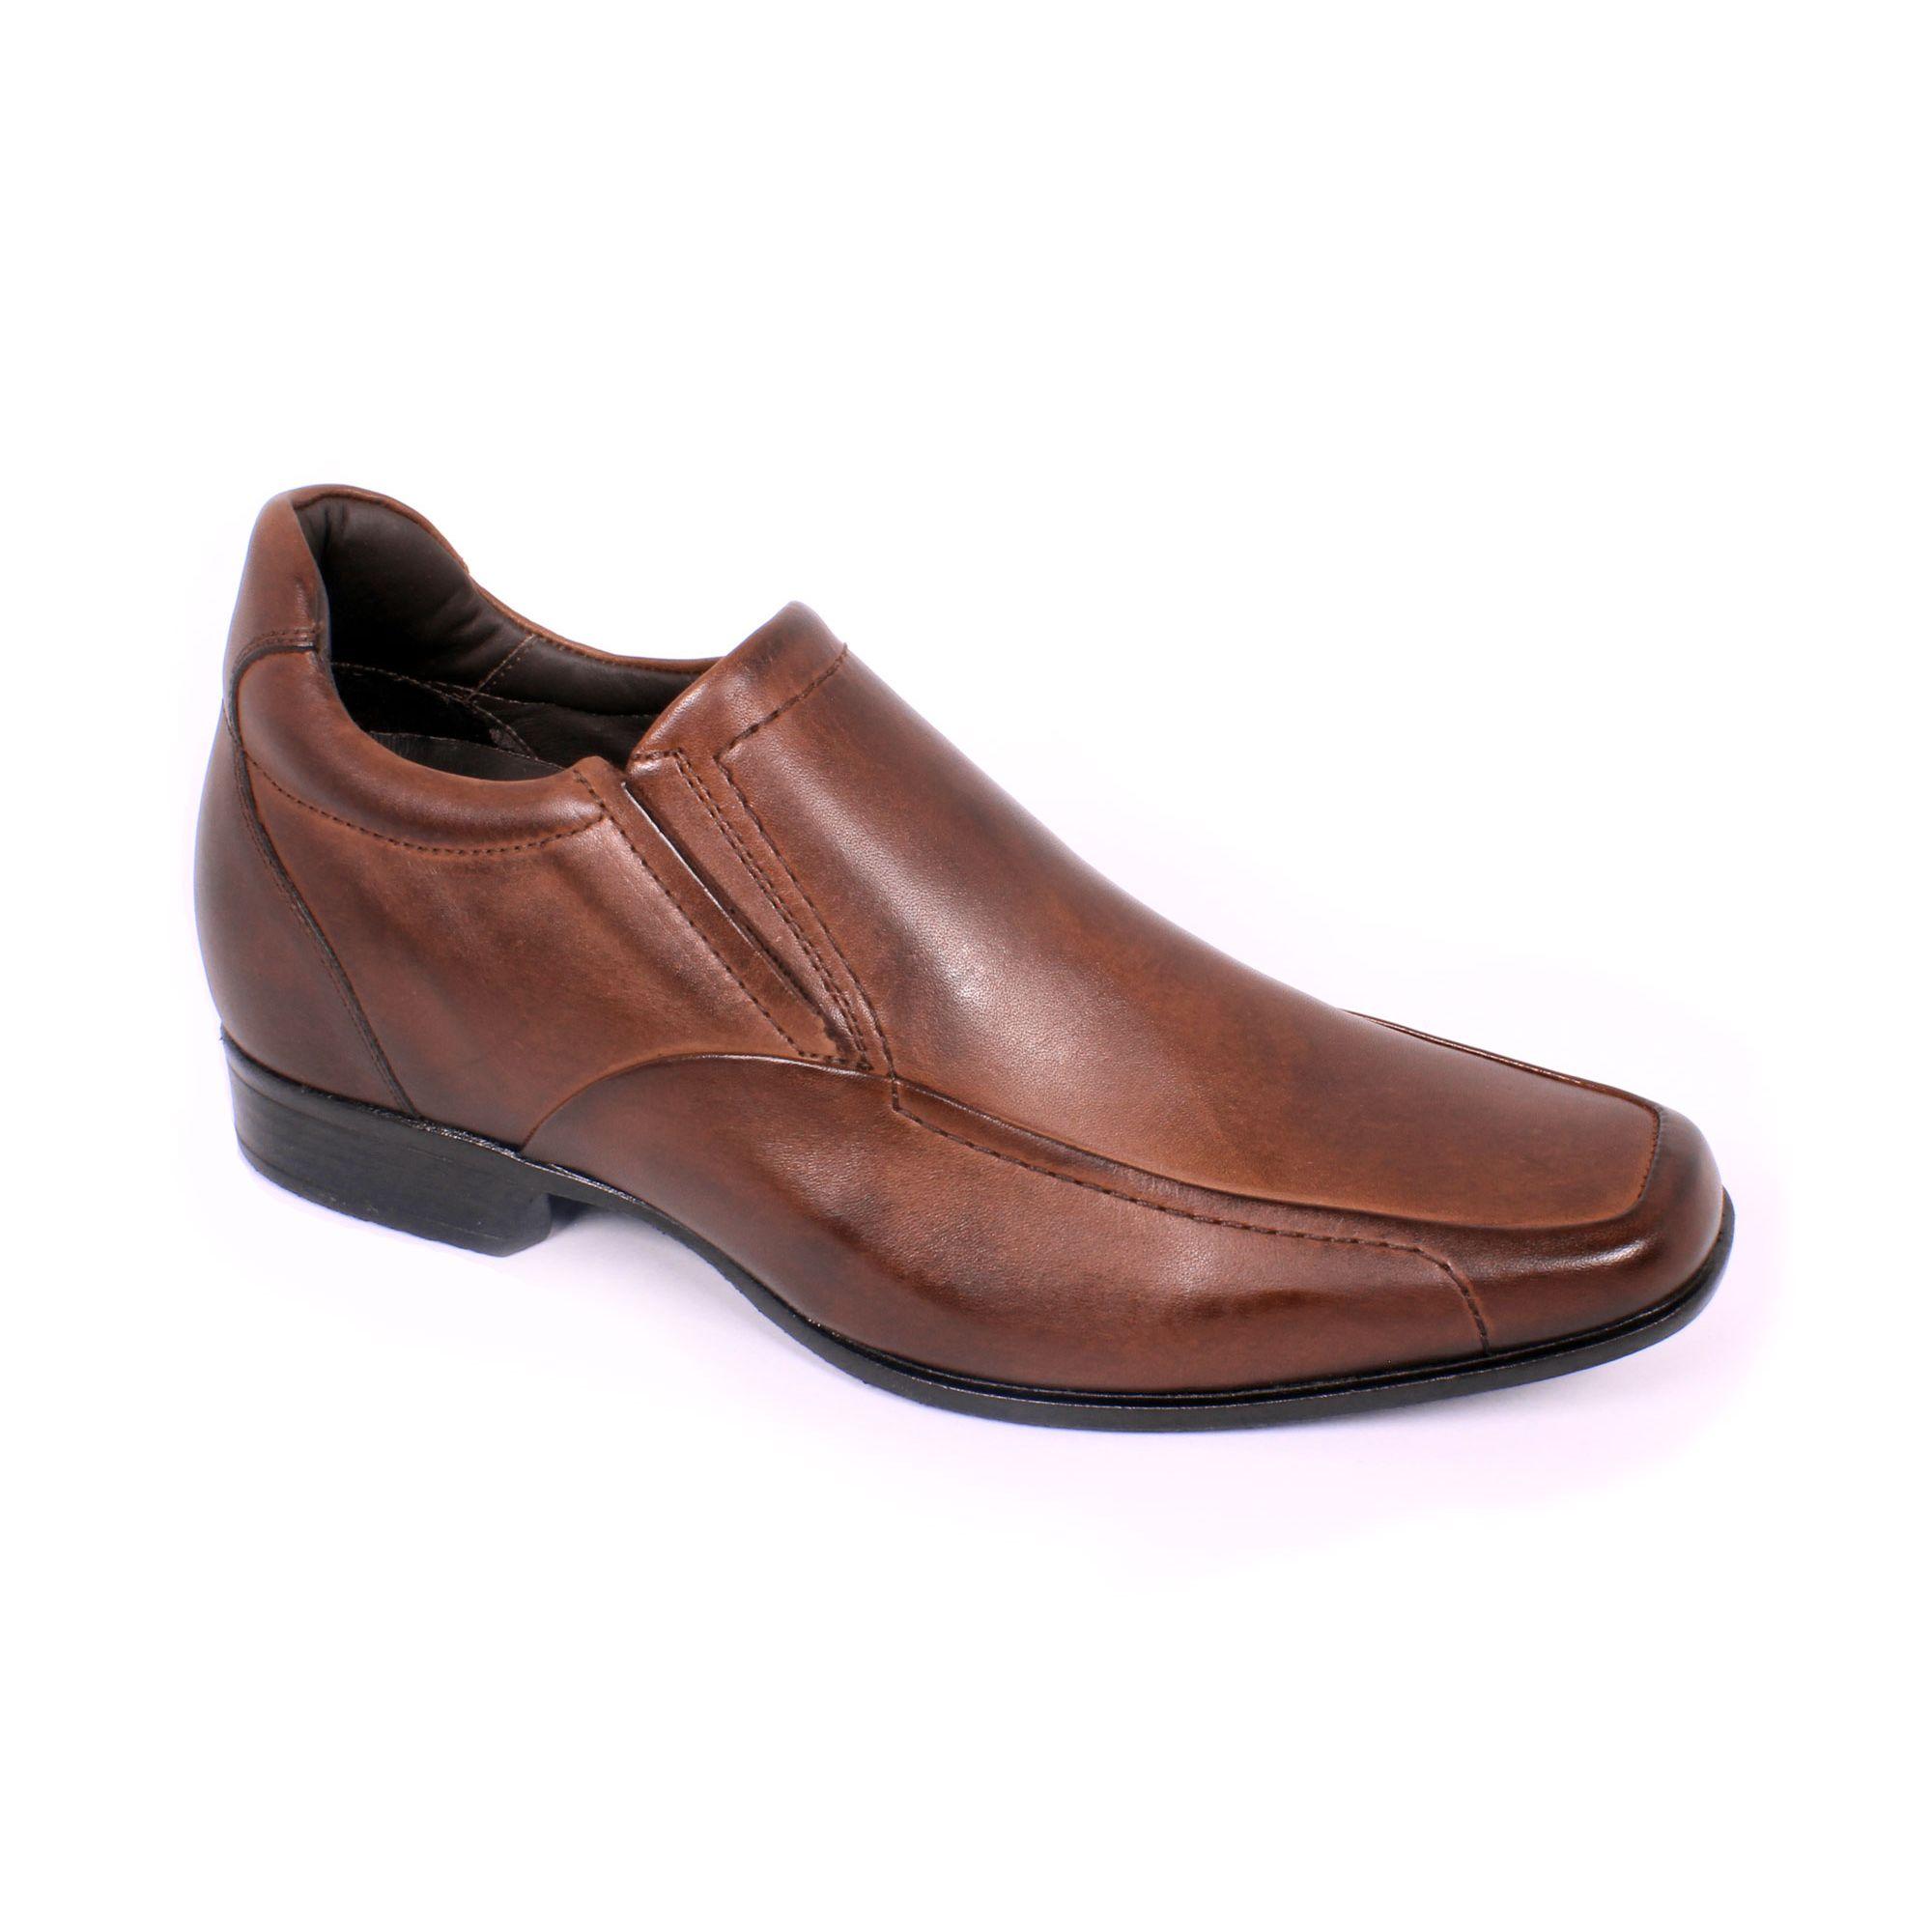 Zapato Formal Tabaco Café Max Denegri +7cms de Altura_70845